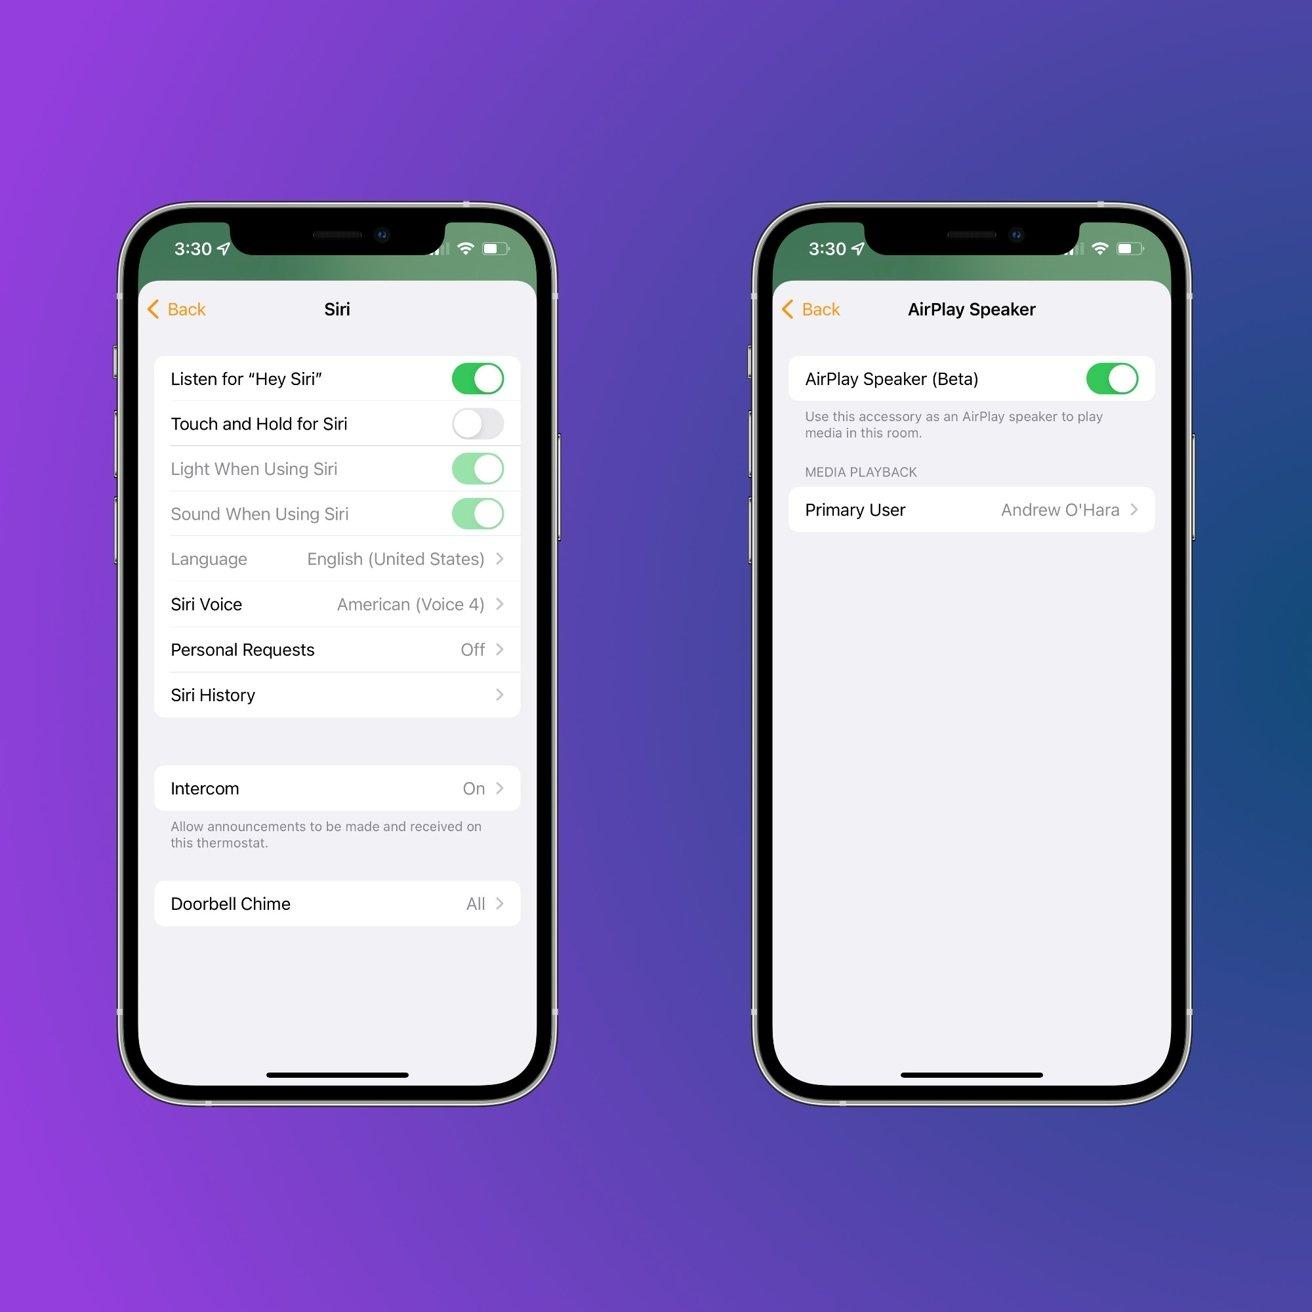 Ecobee SmartThermostat settings